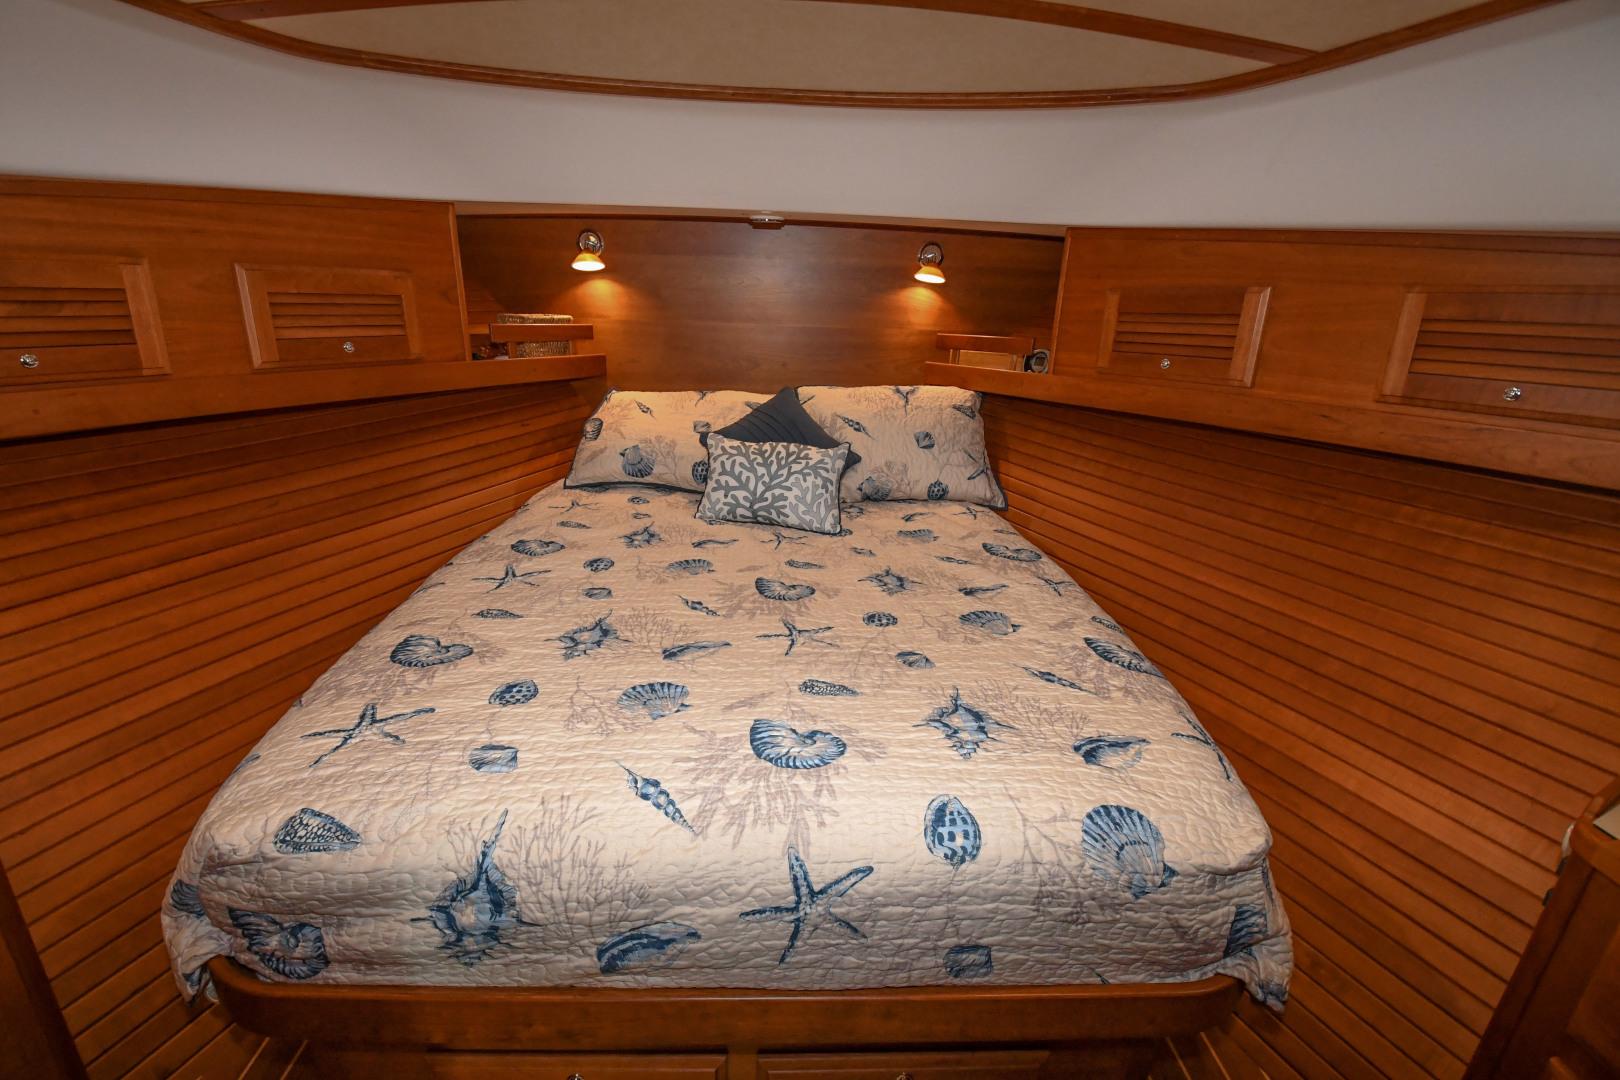 Sabre-40 Express 2010-Impulse Treasure Island-Florida-United States-2010 40 Sabre Express  Impulse  Master Stateroom-1618638 | Thumbnail